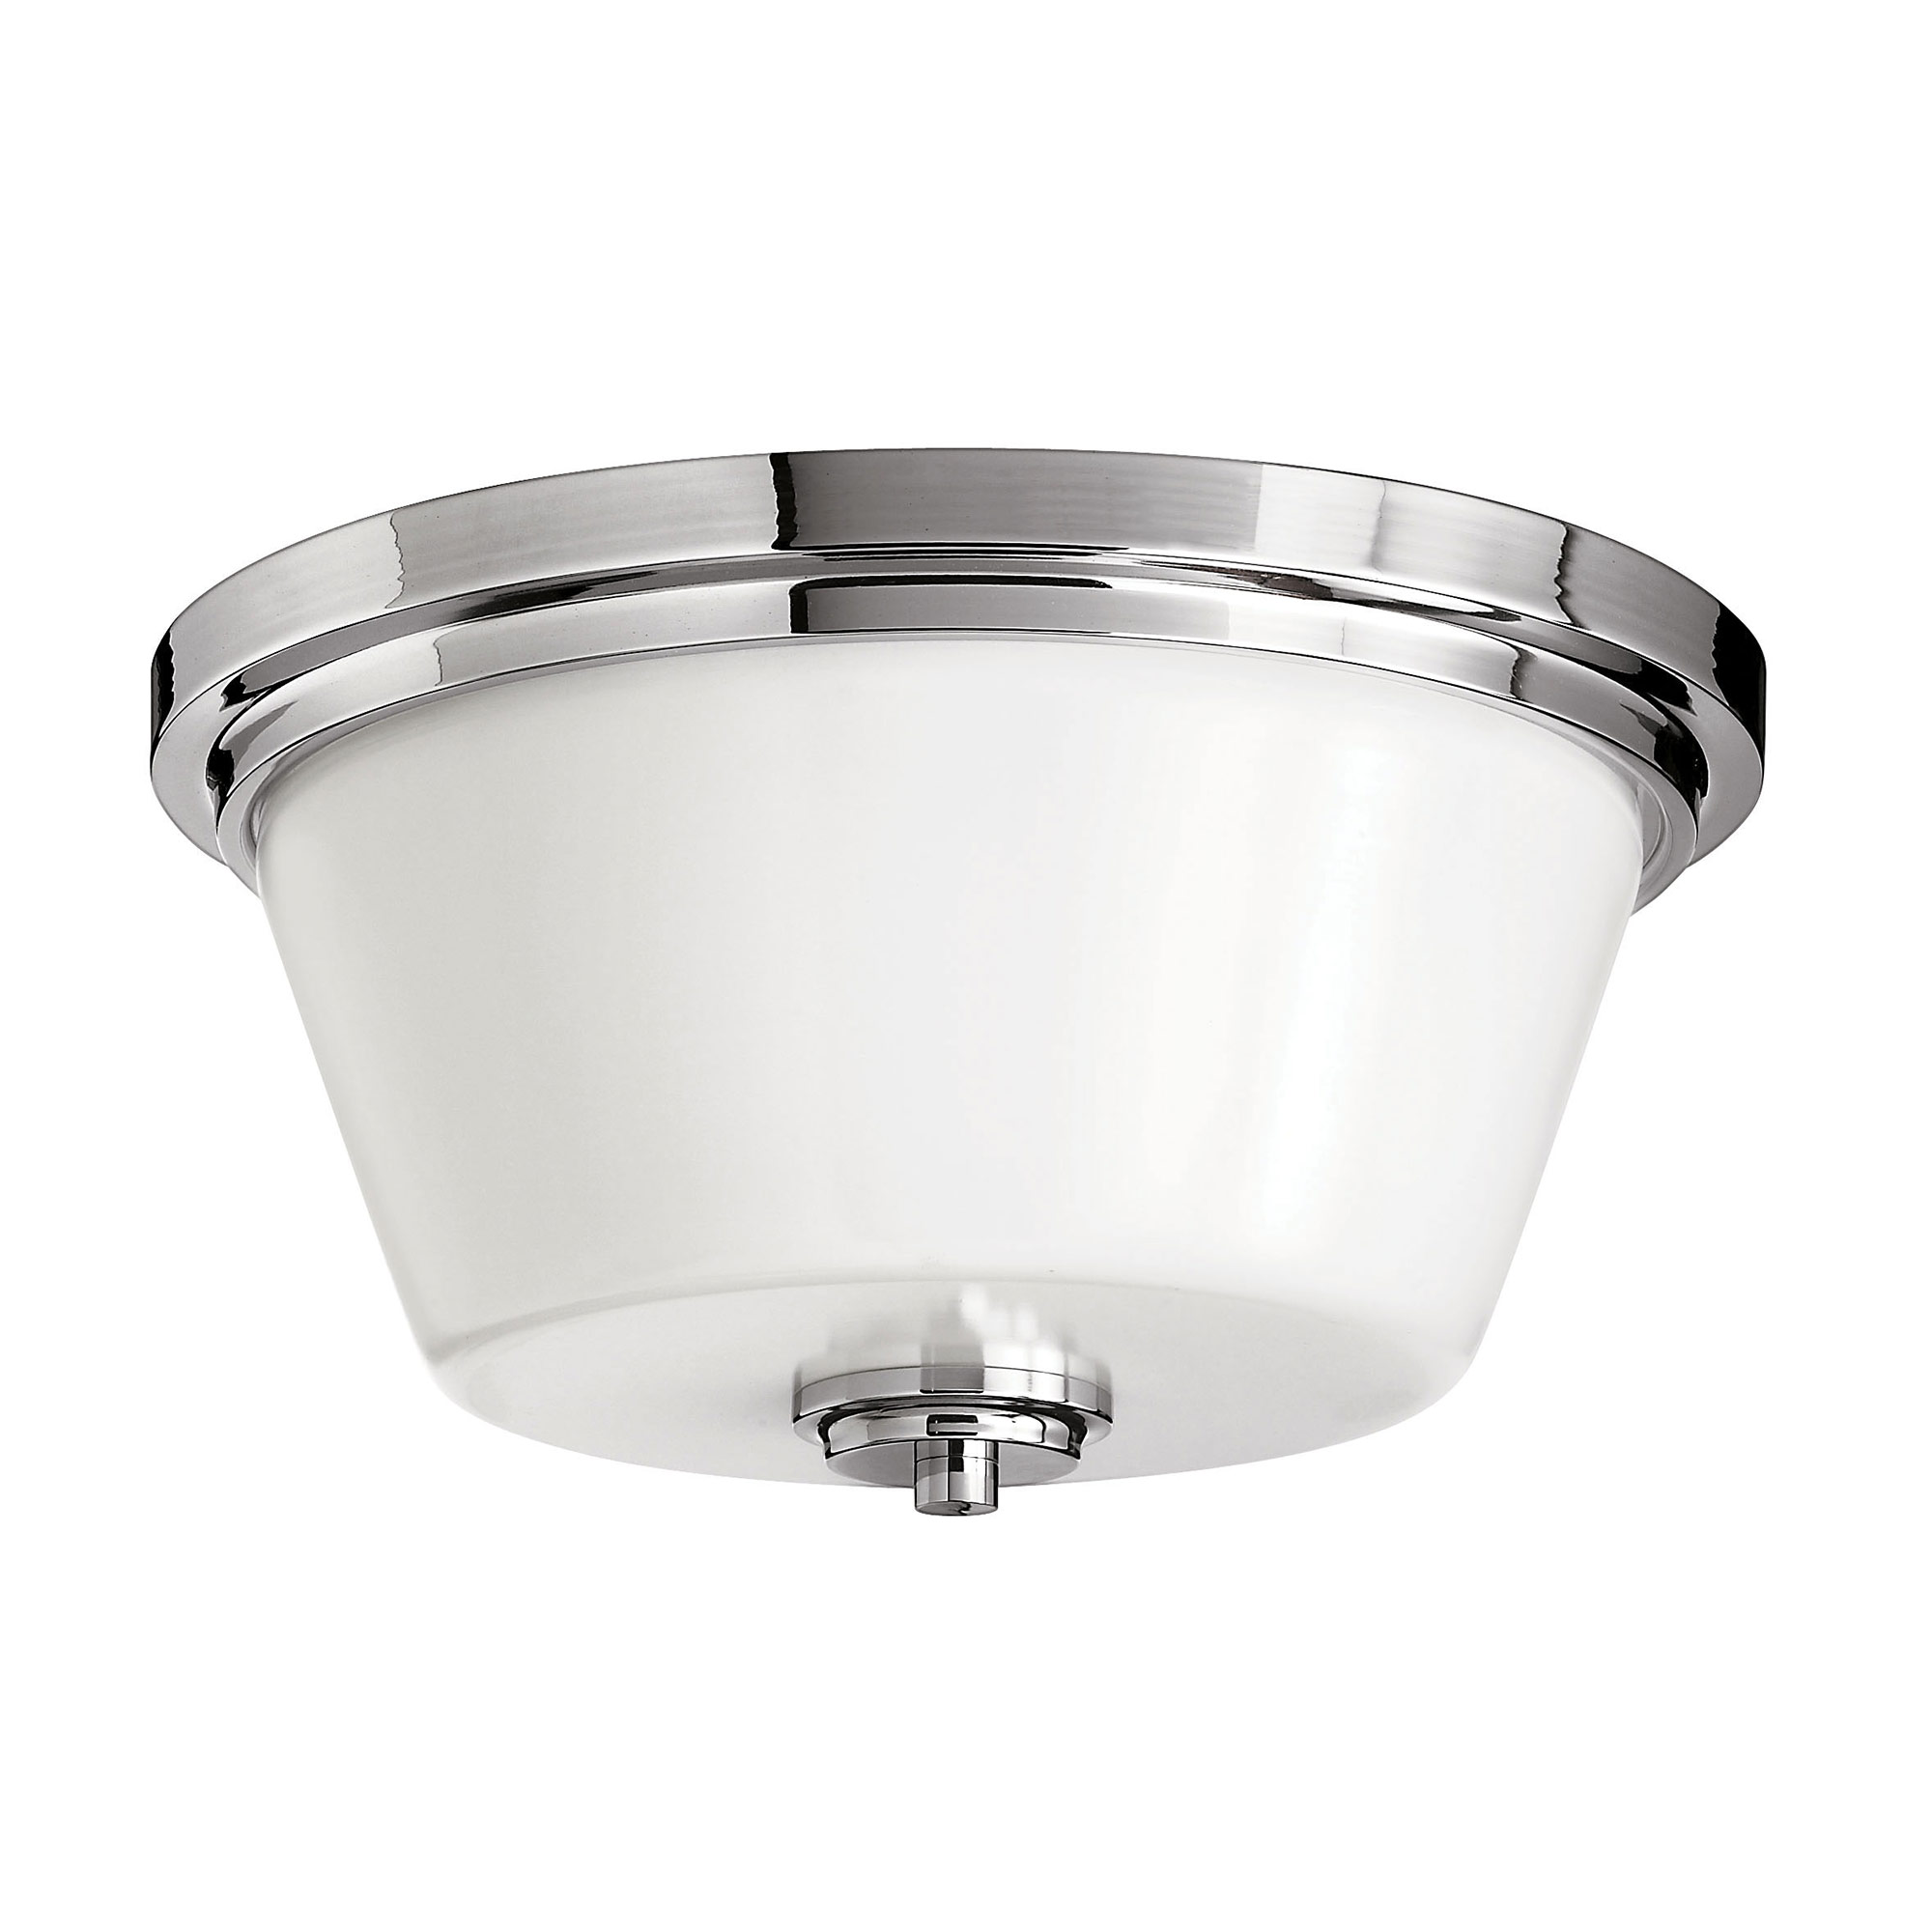 ceiling light fixture by hinkley lighting 5551cm